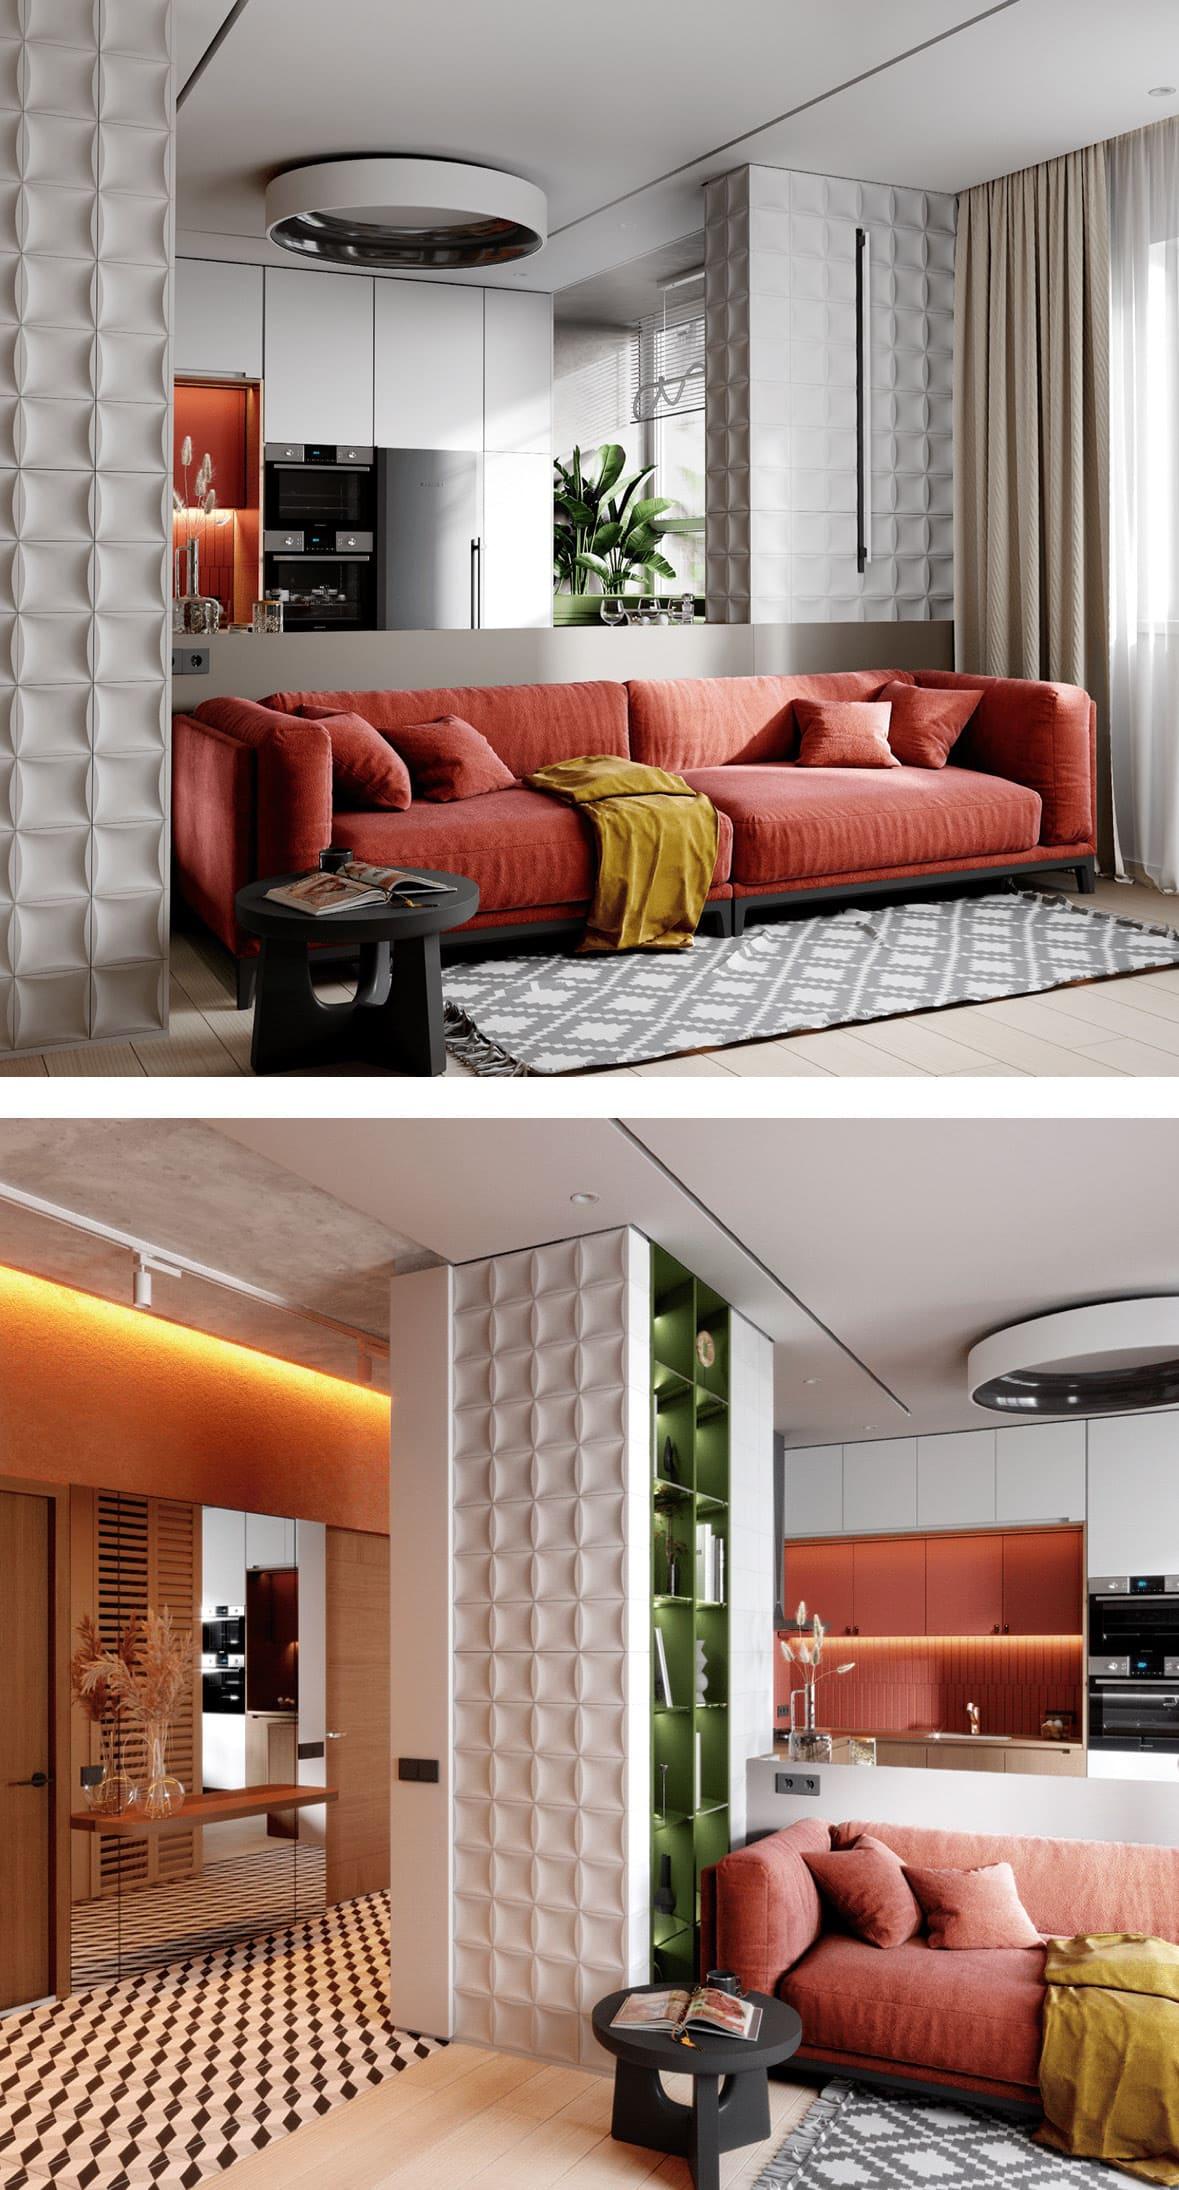 дизайн однокомнатной квартиры фото 27